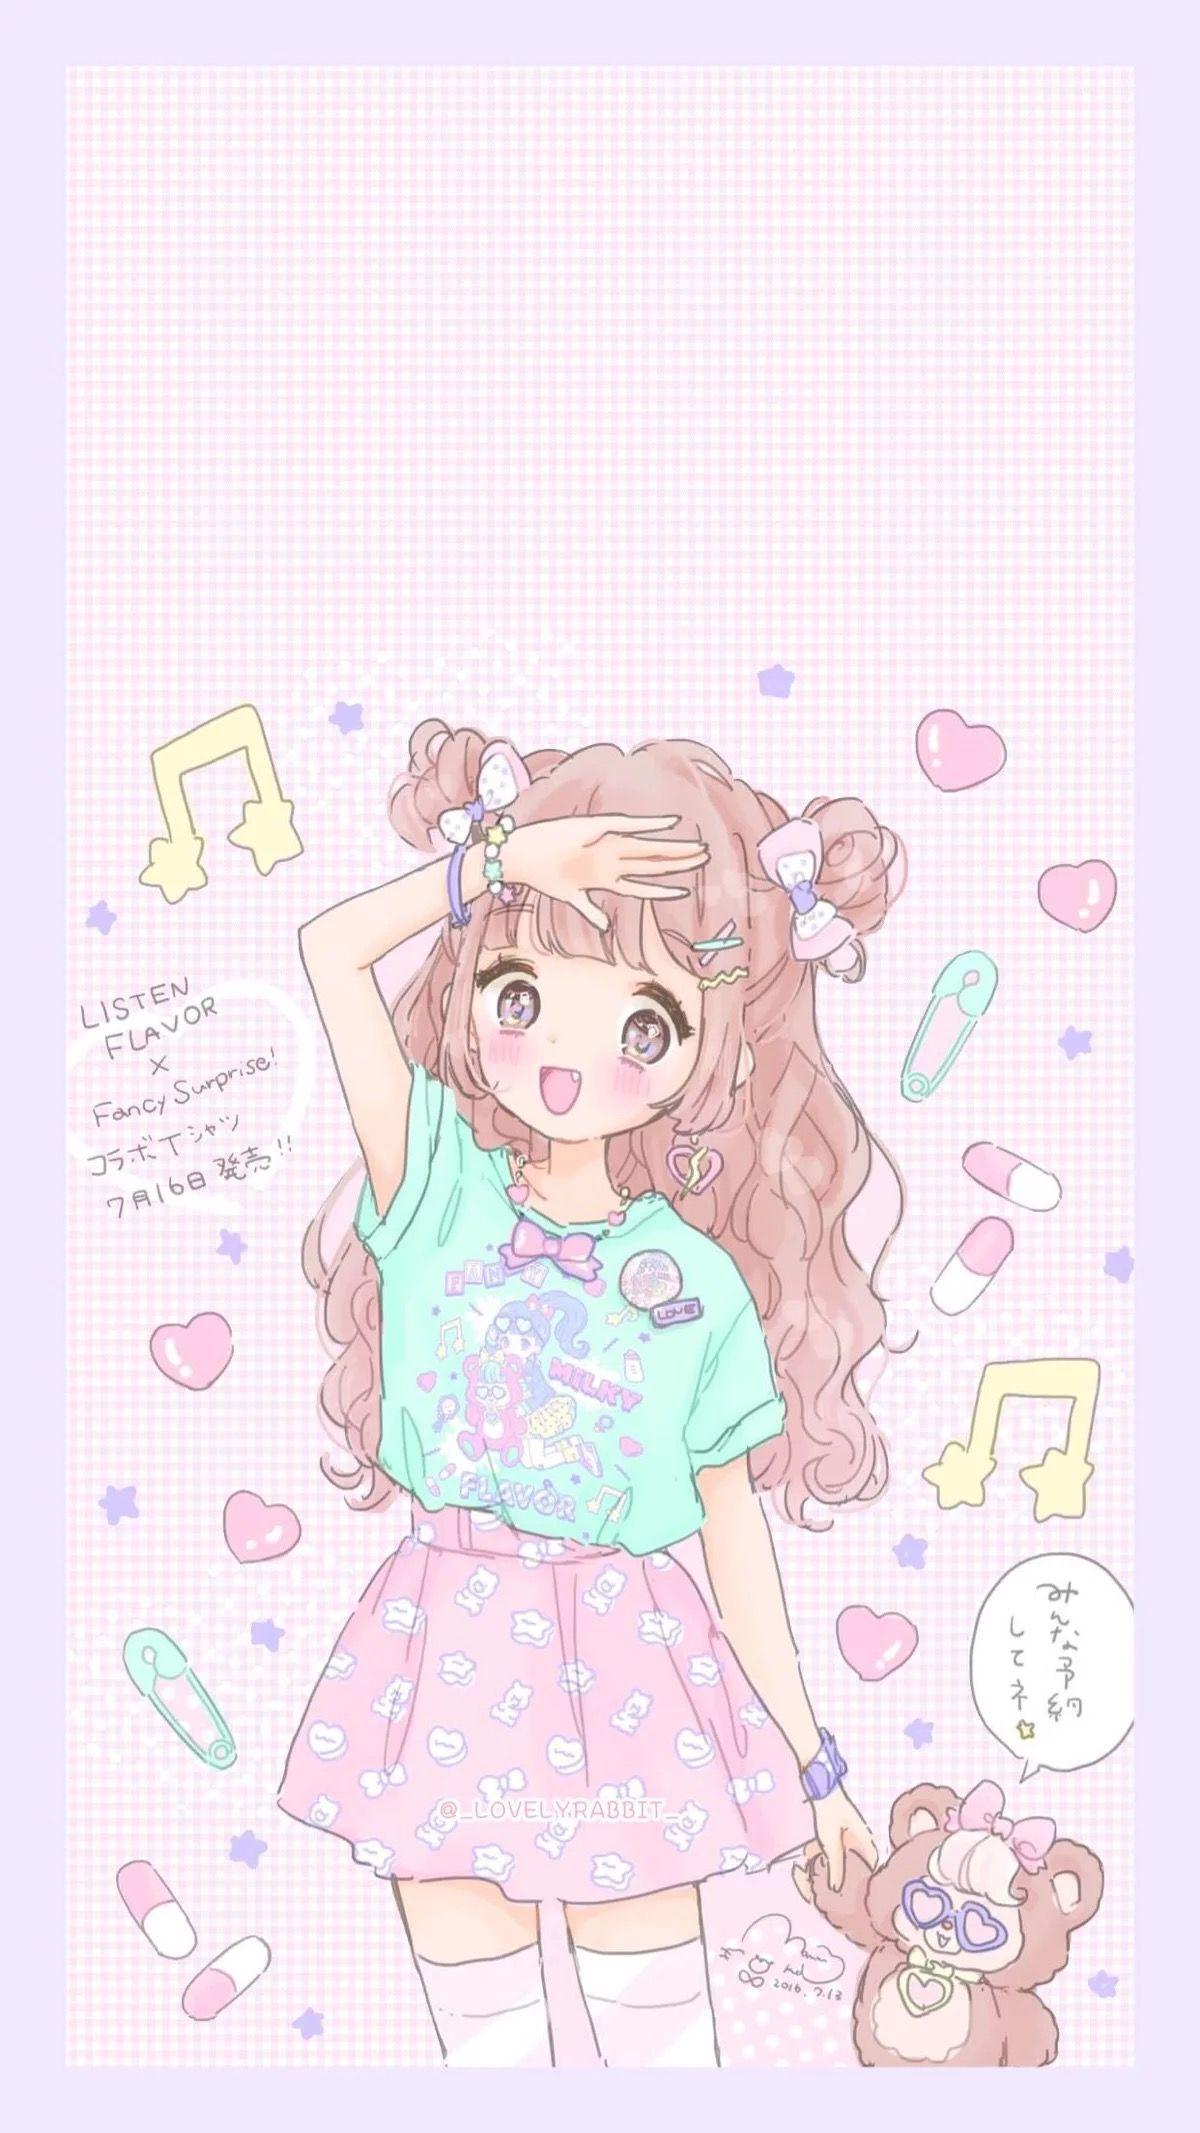 Kawaii Wallpaper Anime : kawaii, wallpaper, anime, Kawaii, Wallpapers, Anime